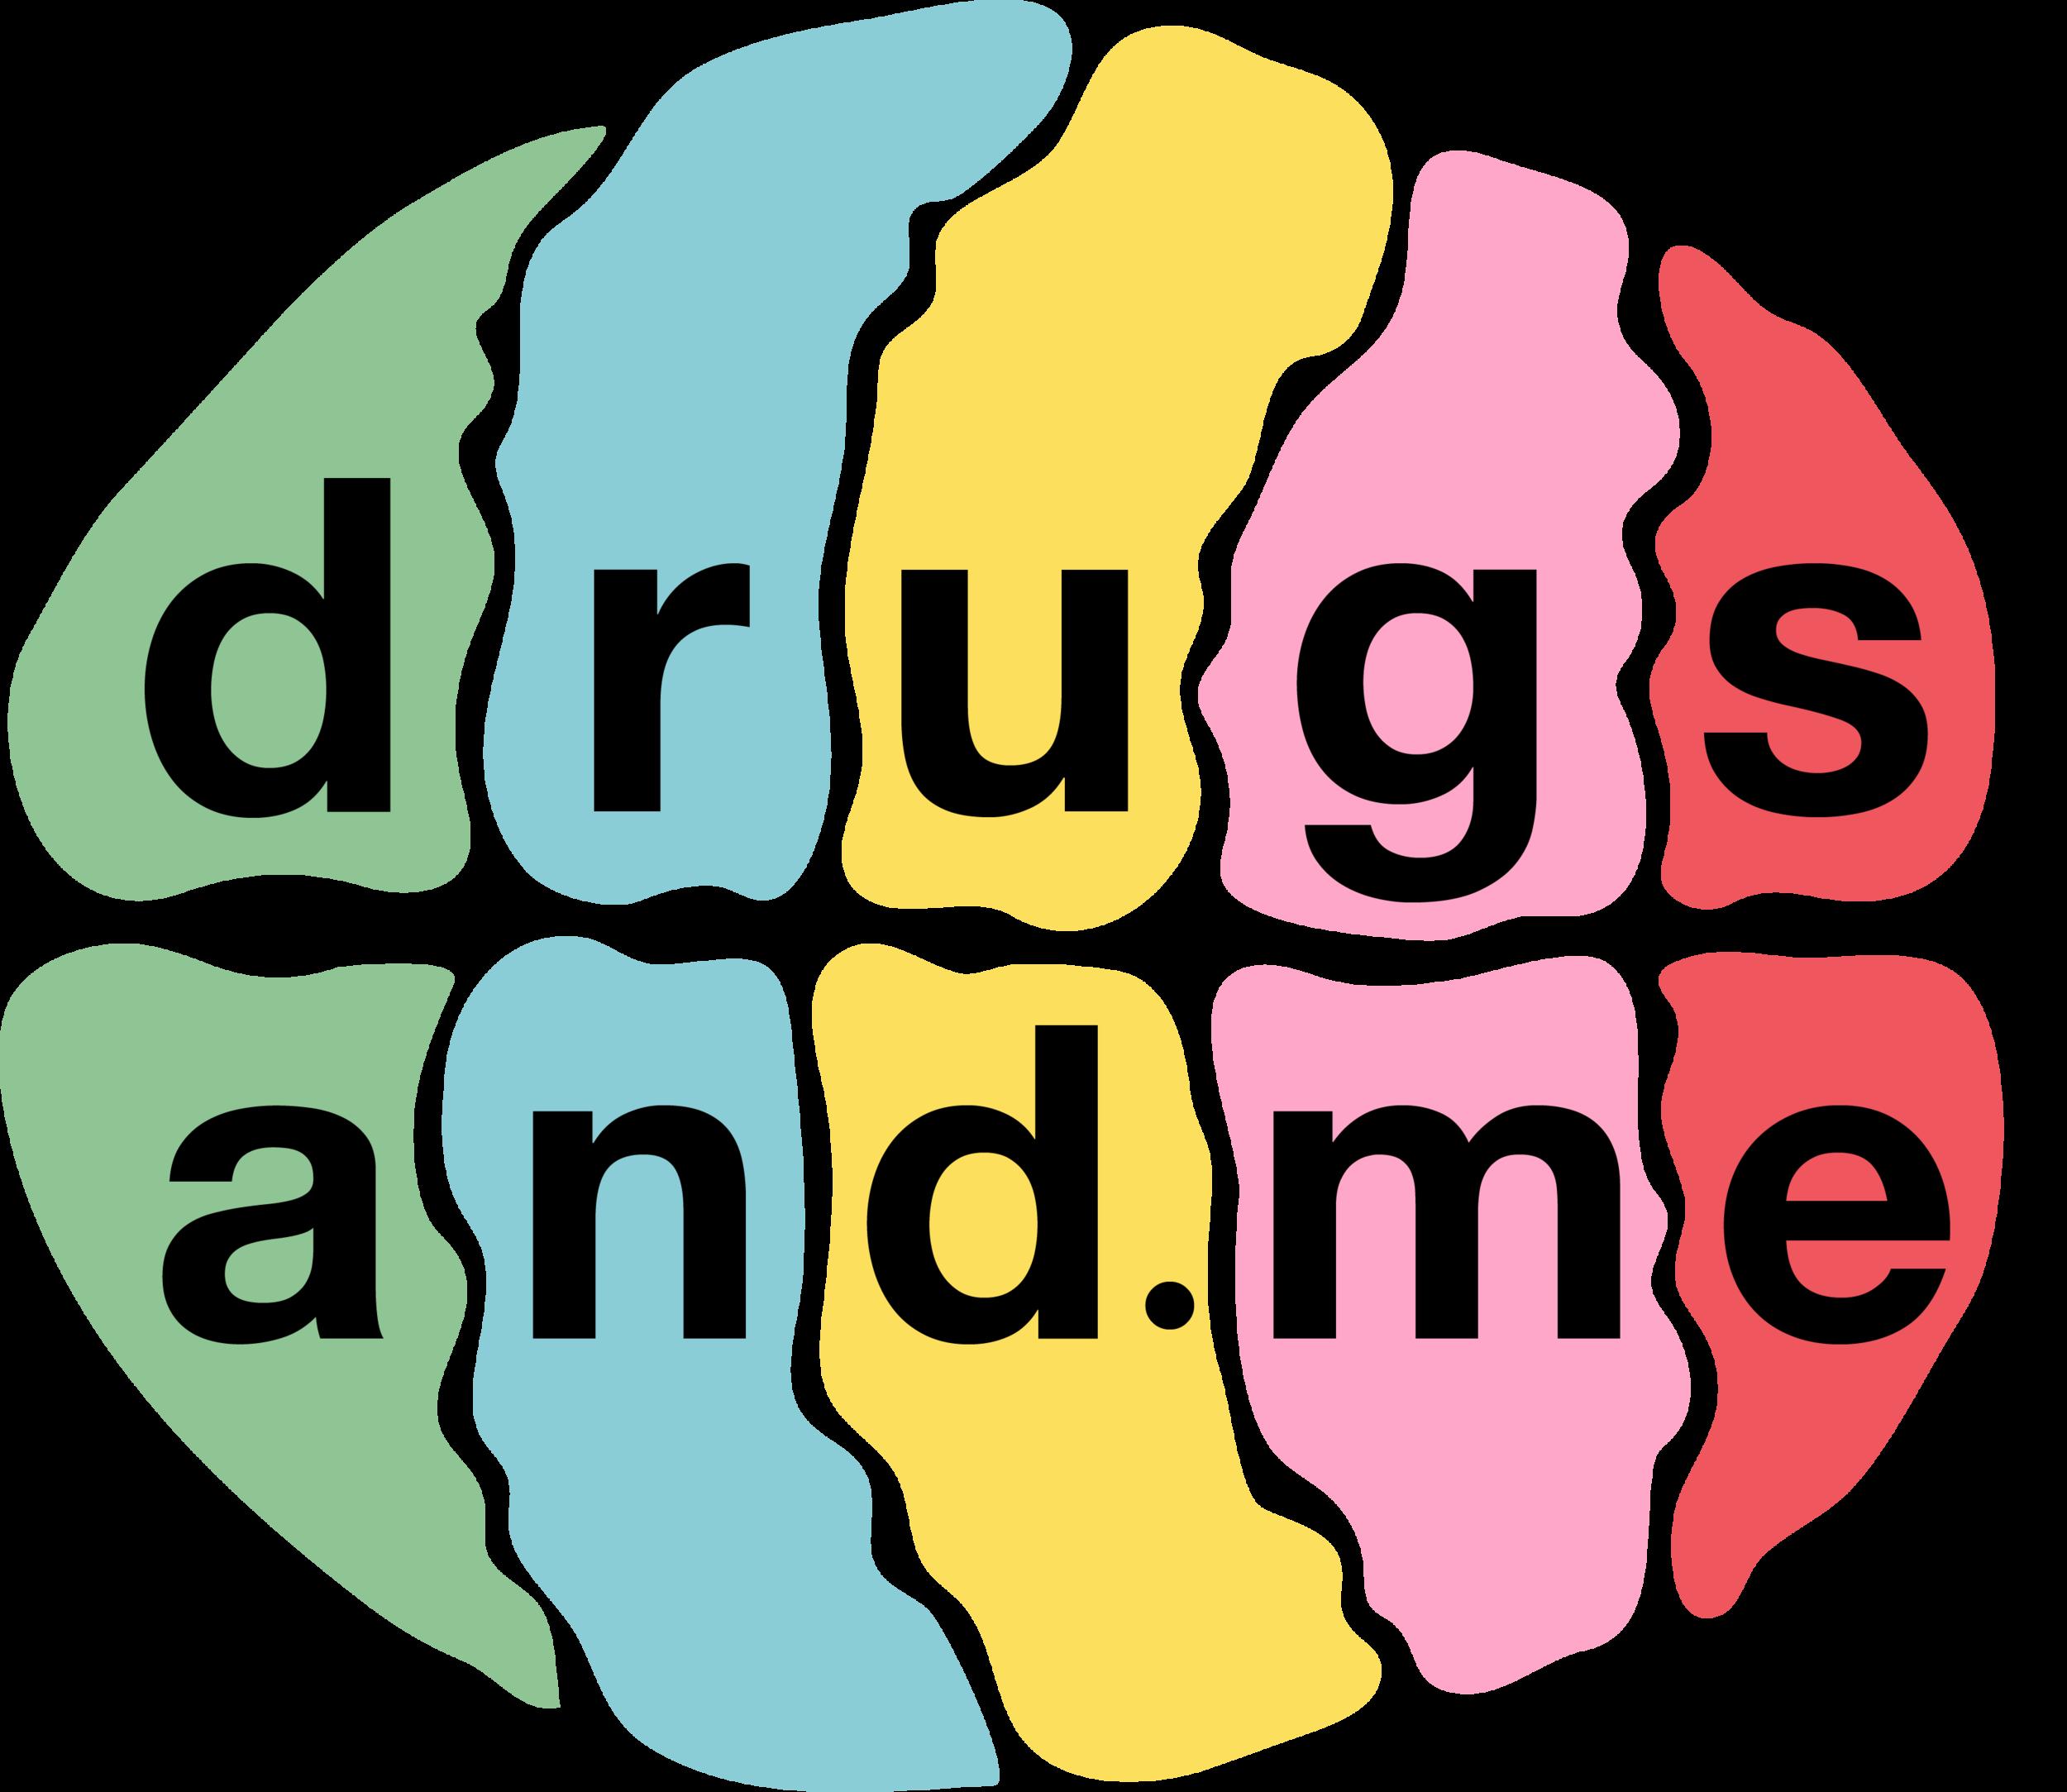 Drugsand.me -